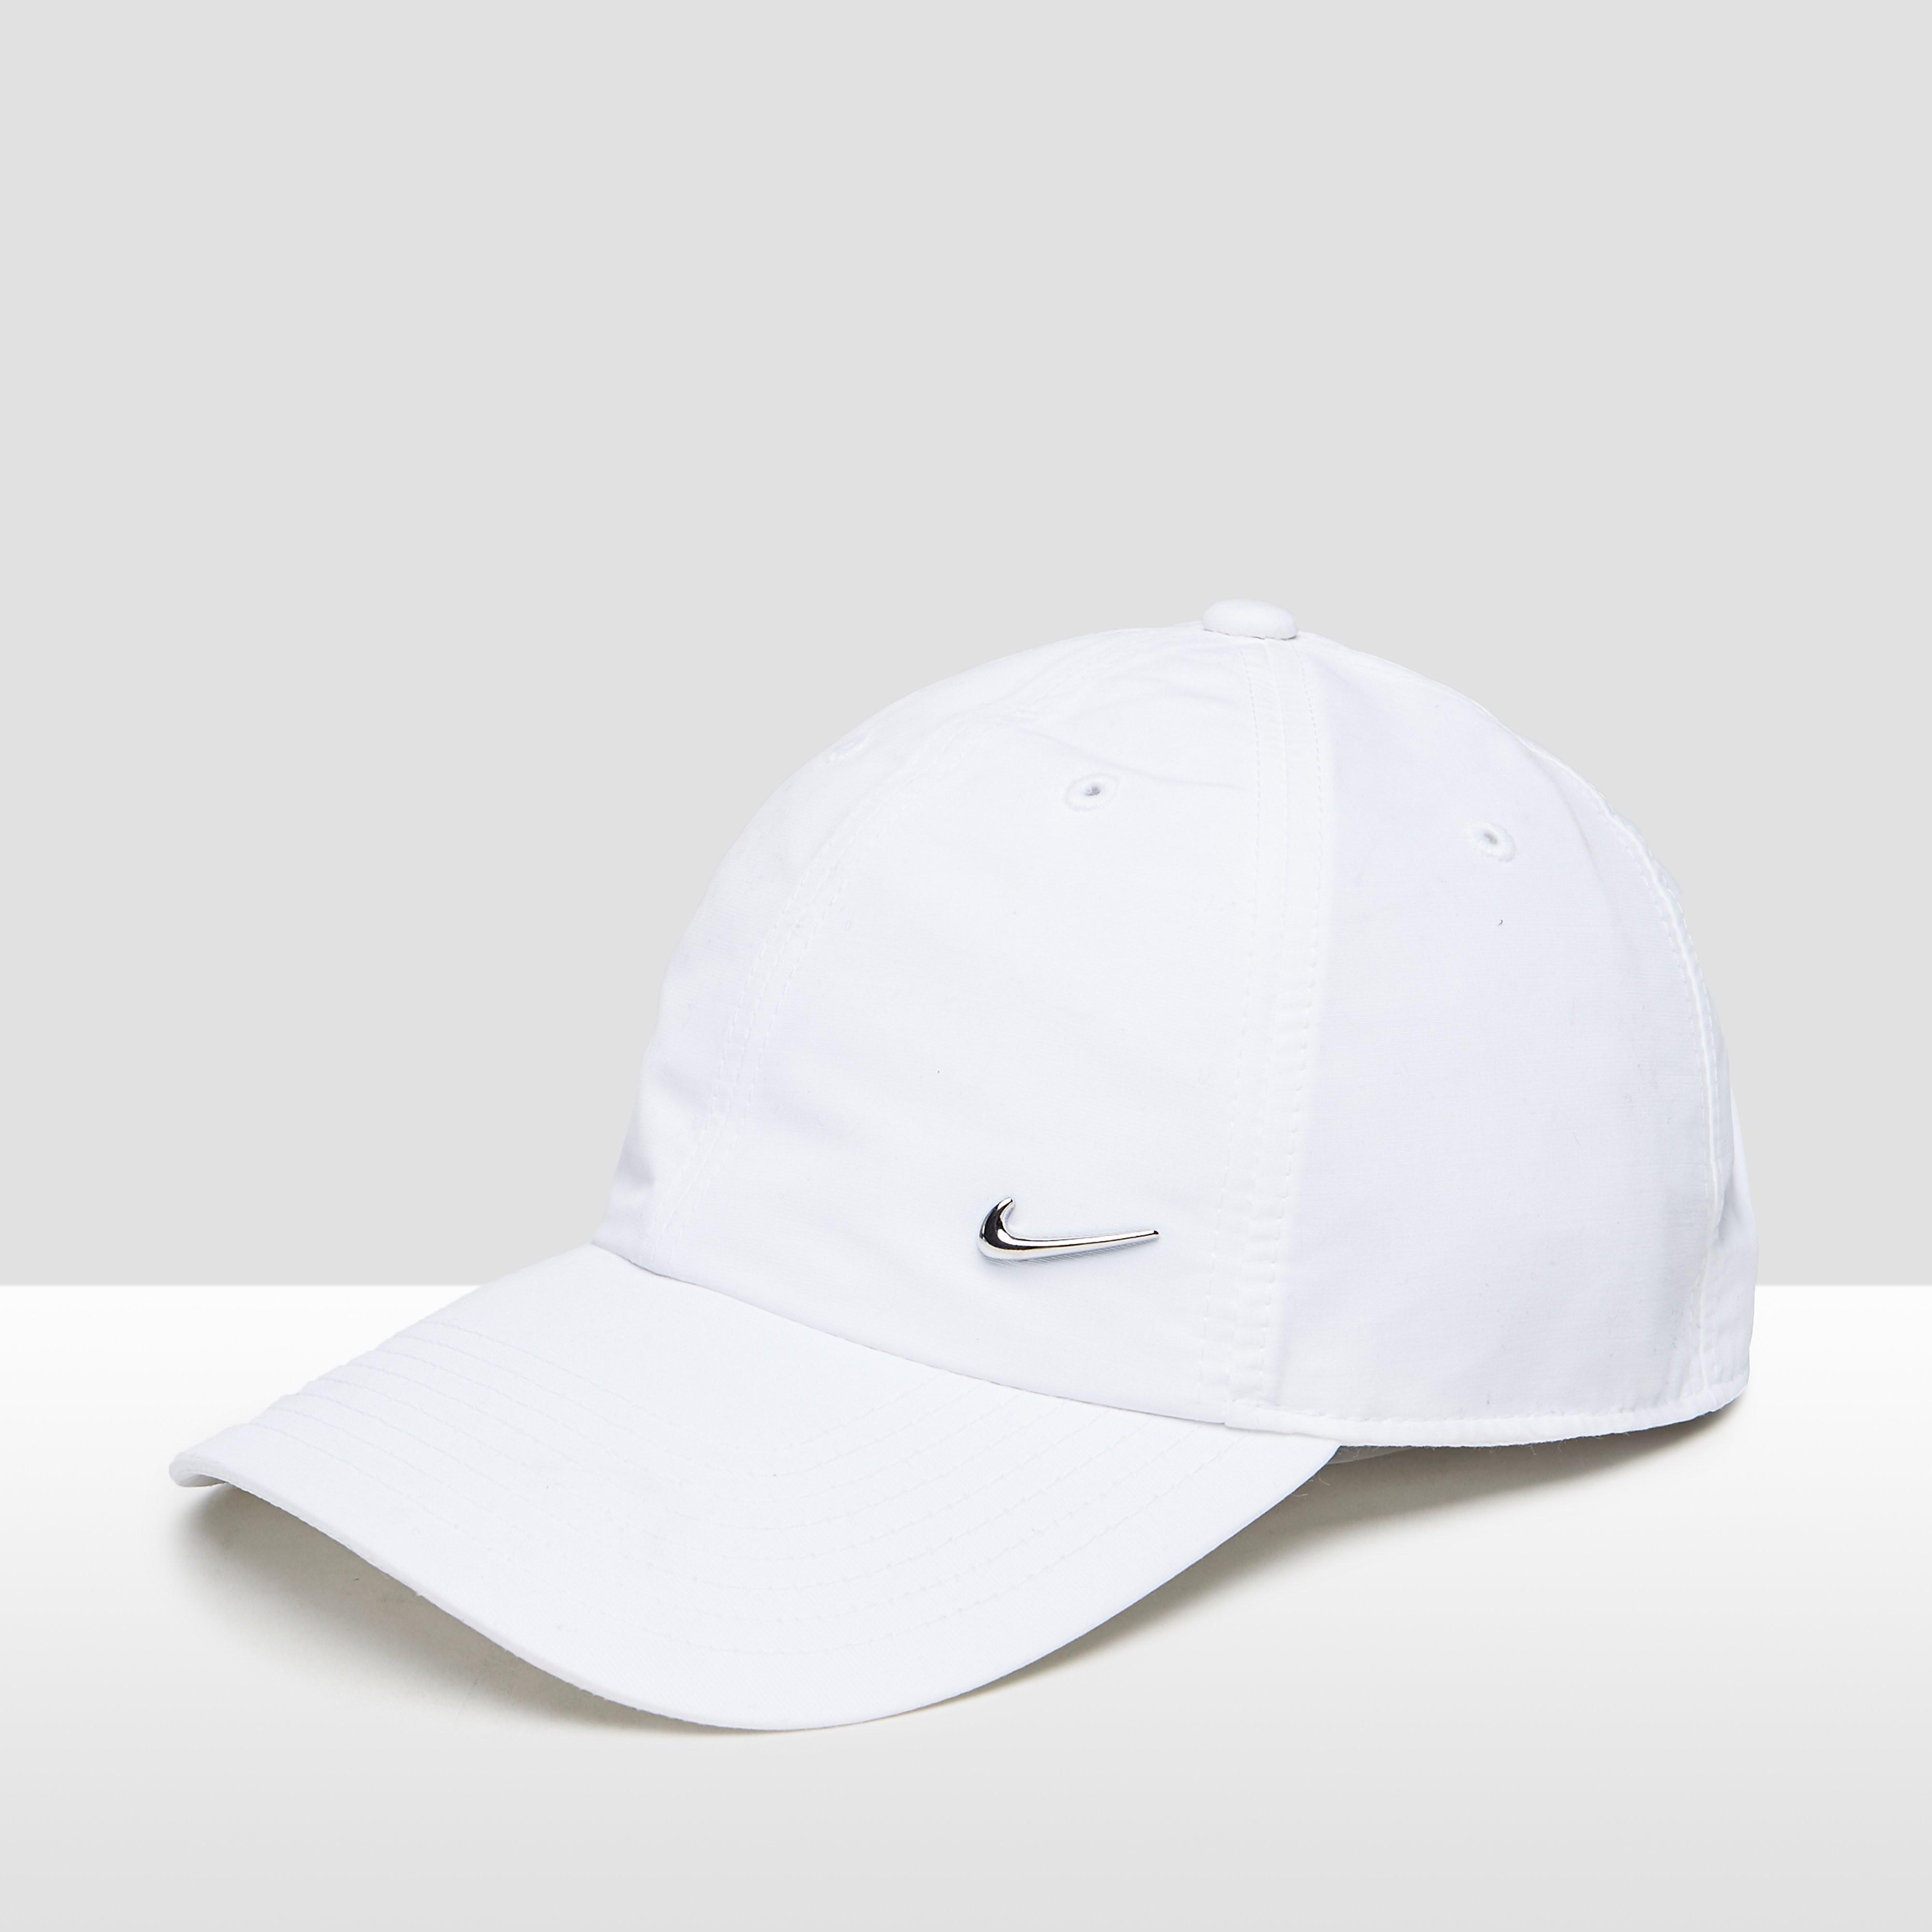 Nike NIK SWOOSH LOGO CAP WHI W